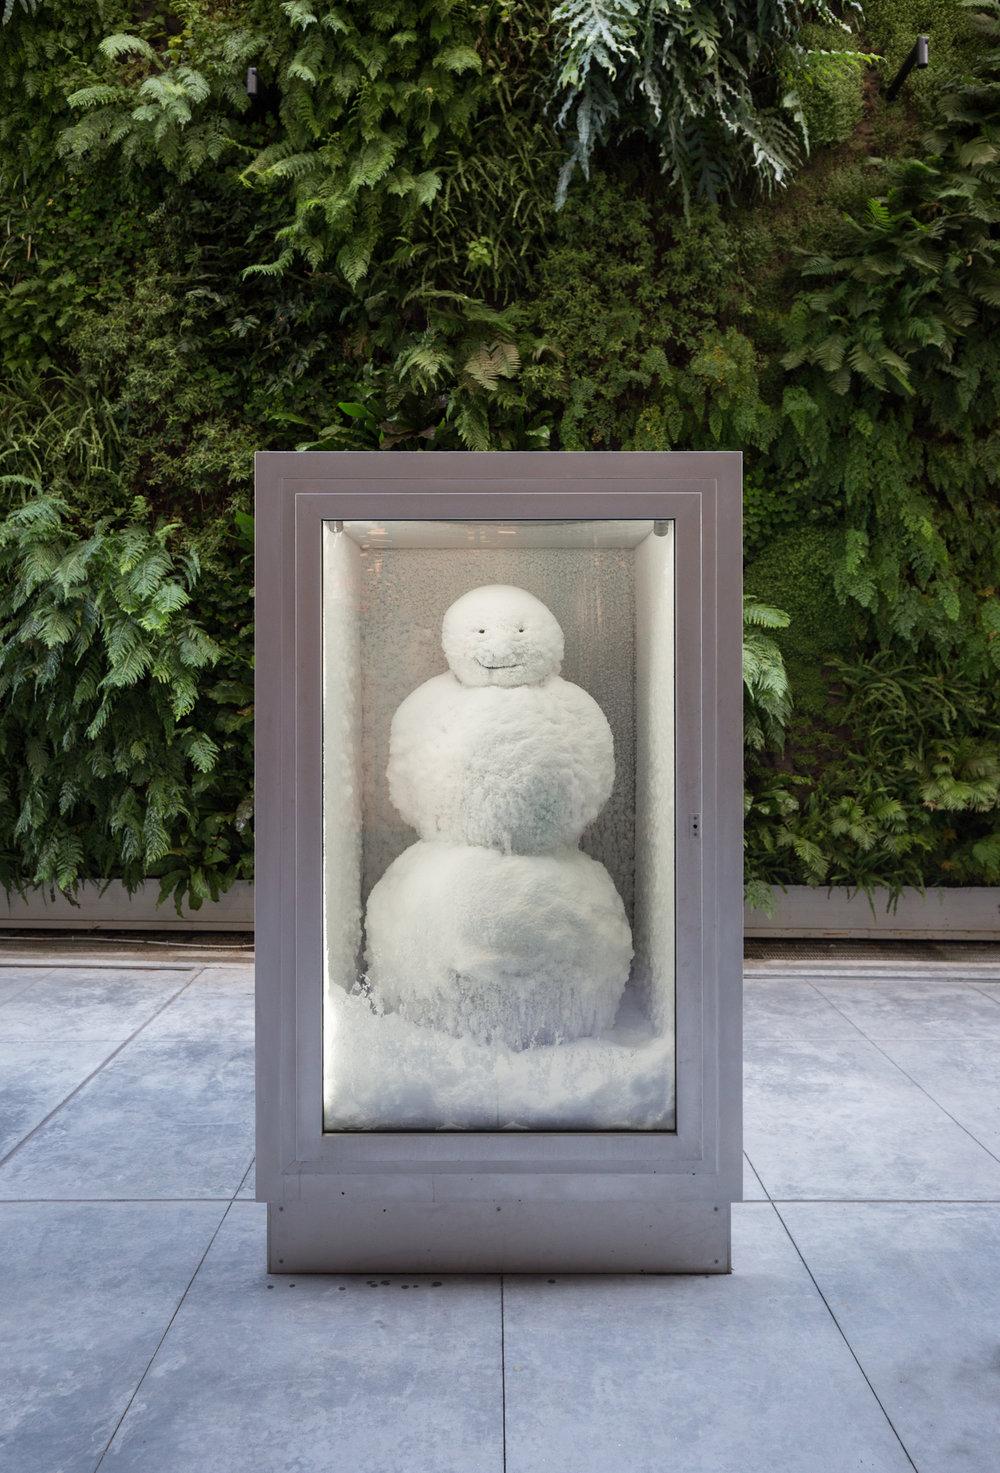 01_Snowman.jpg